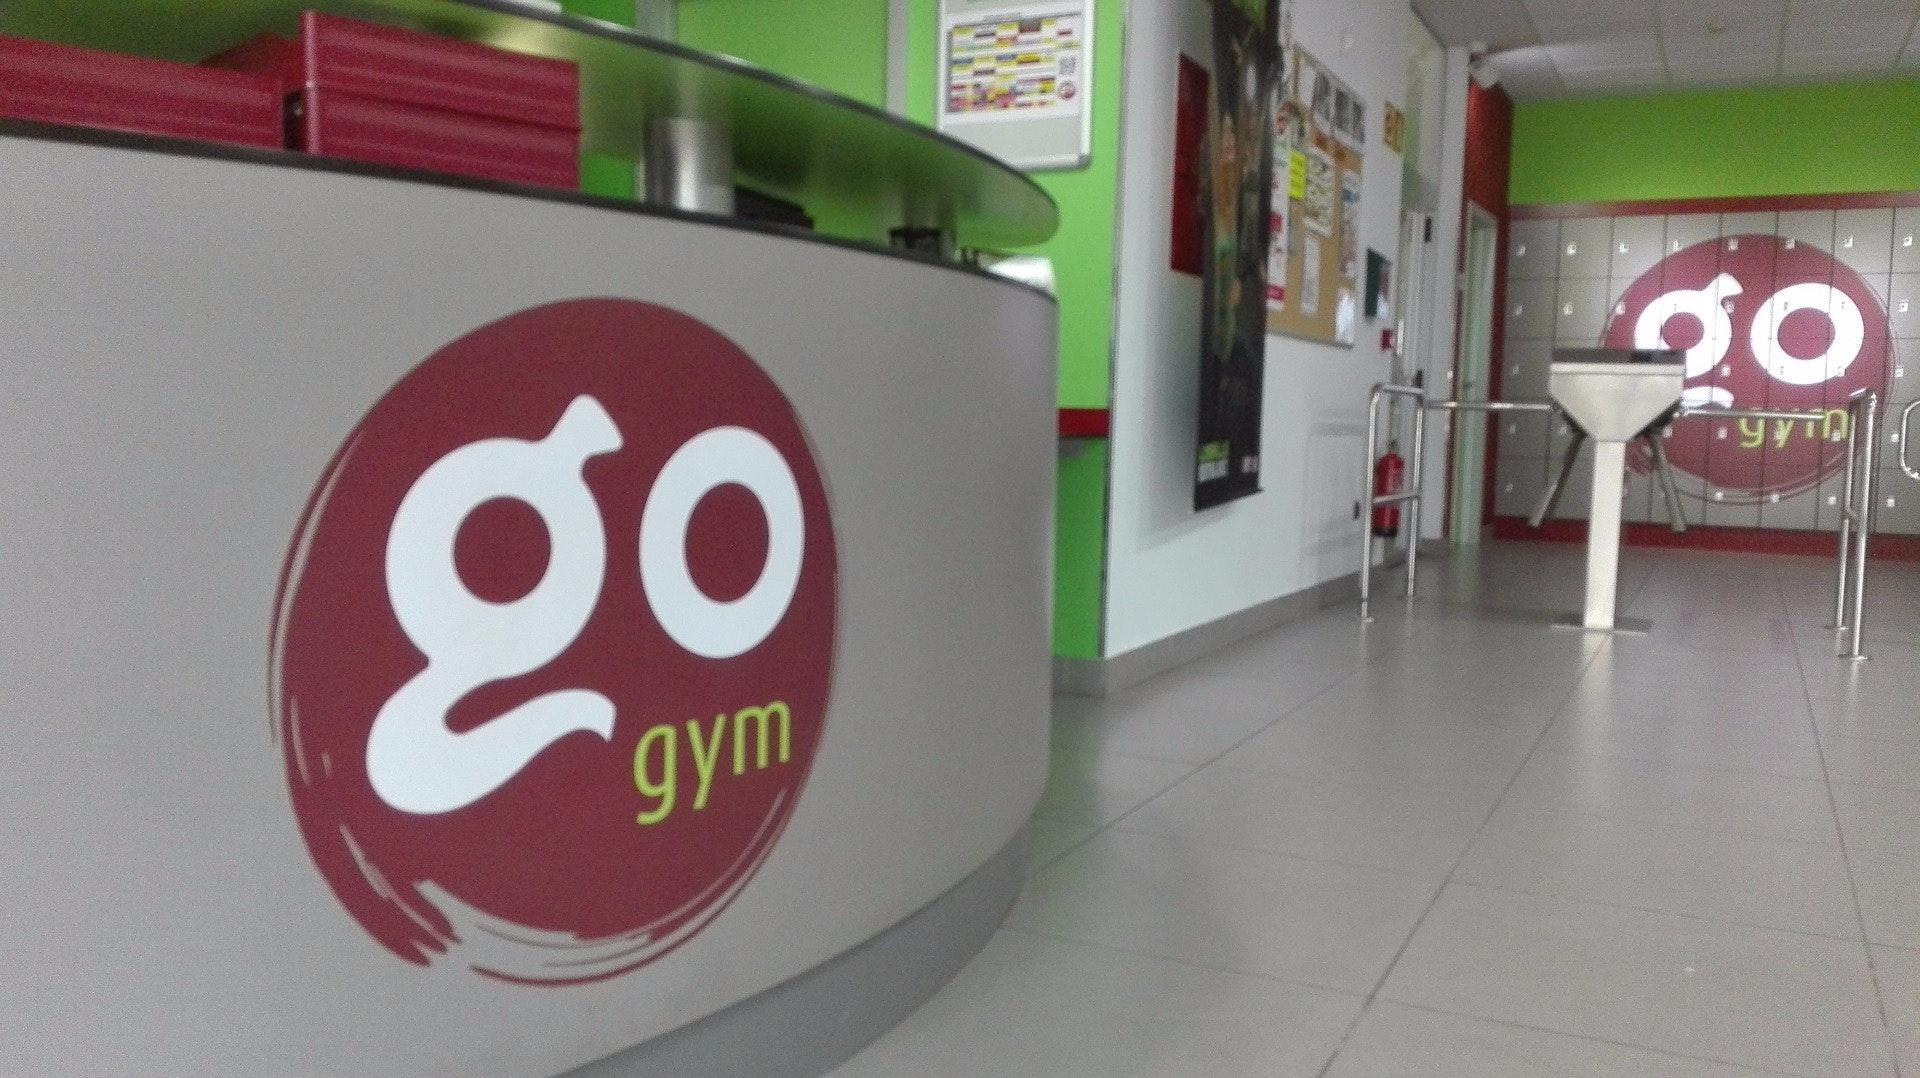 Foto 4 Oferta GO GYM Vitoria-Gasteiz {2} - GymForLess